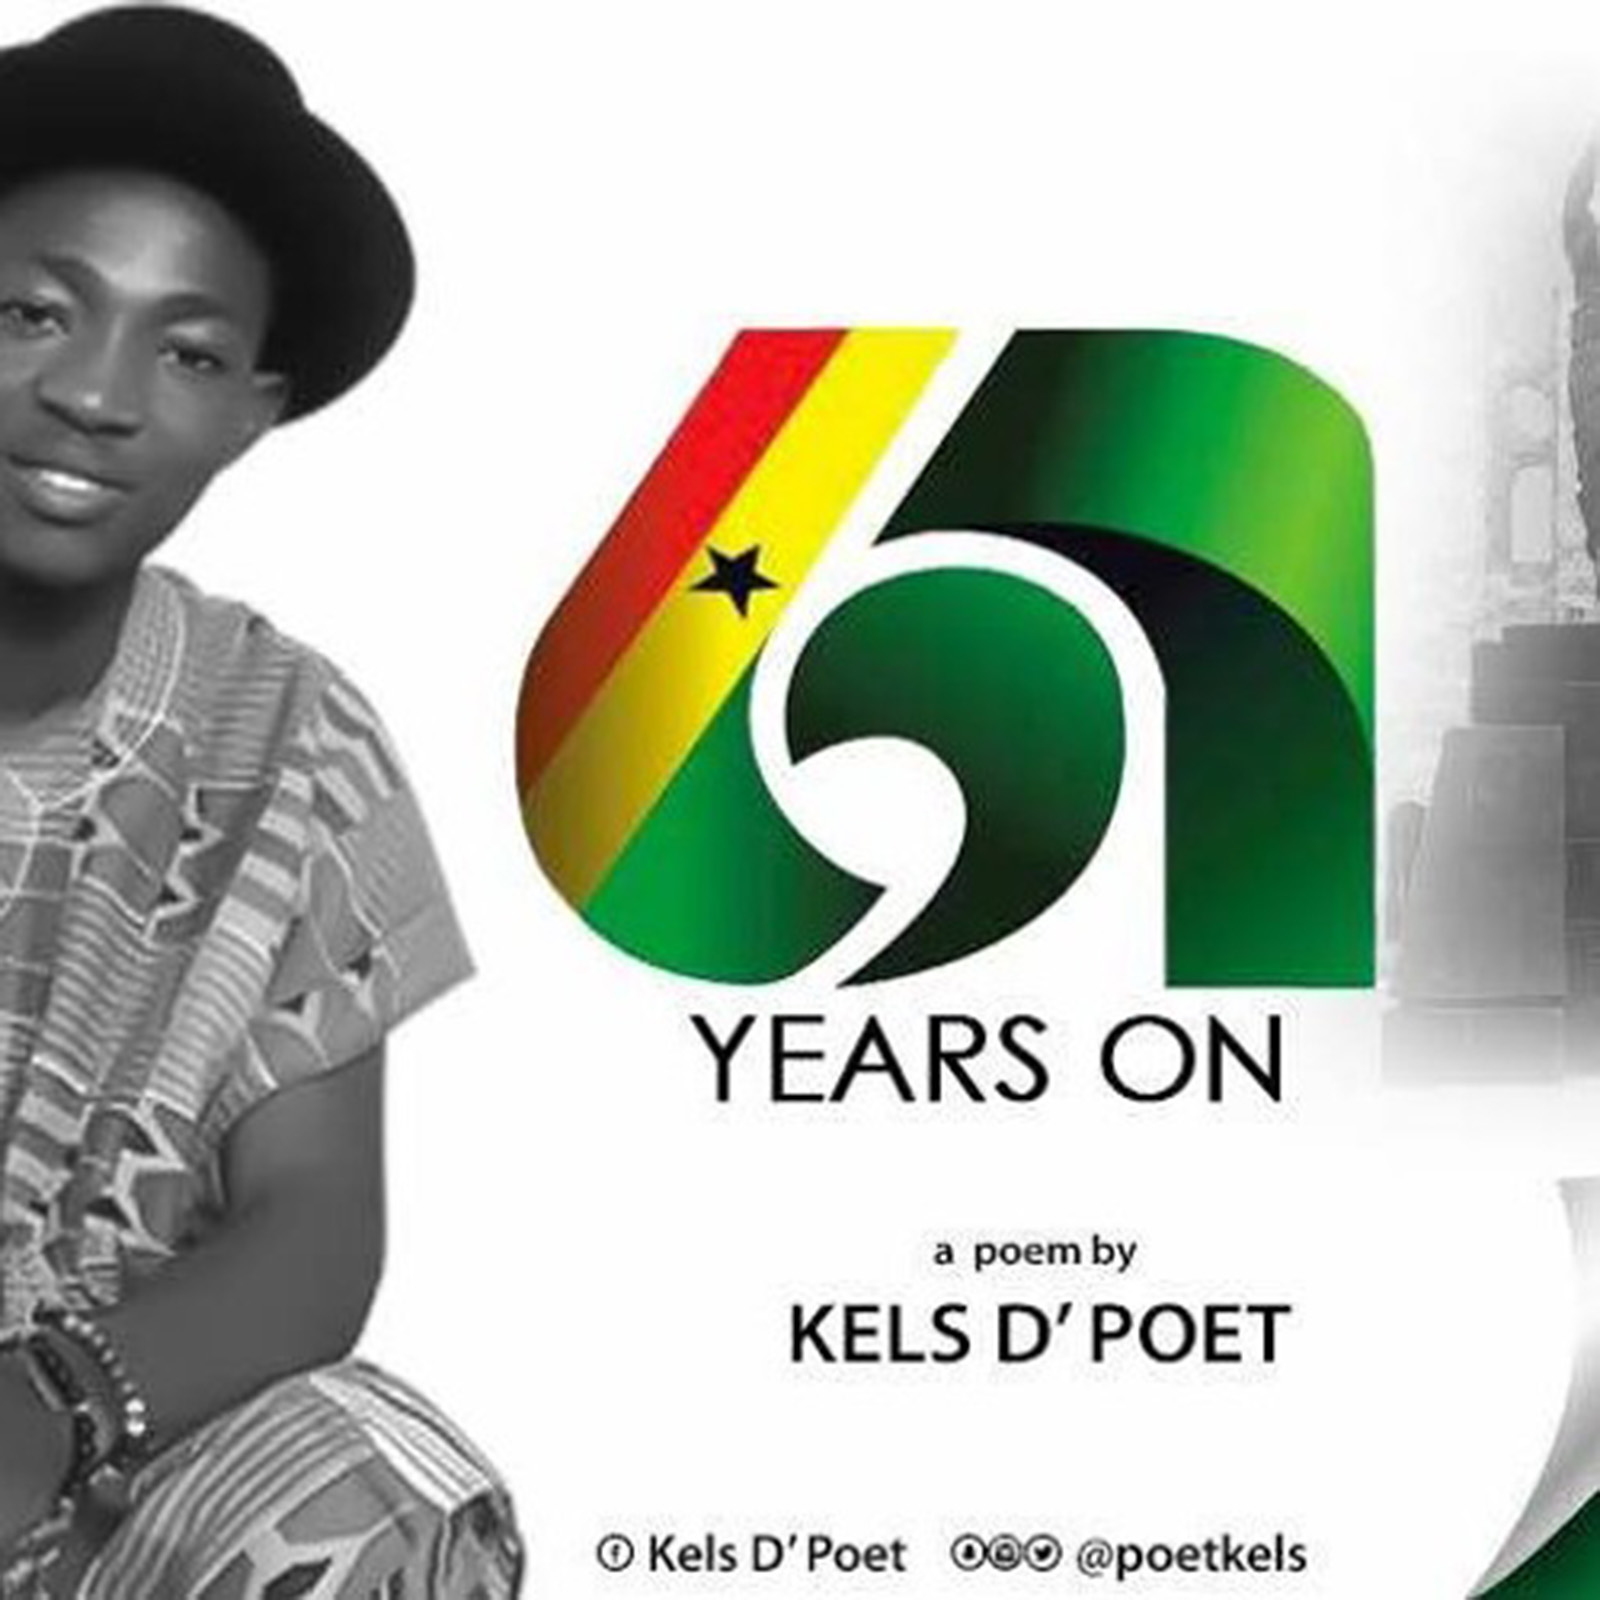 60 years on by Kels